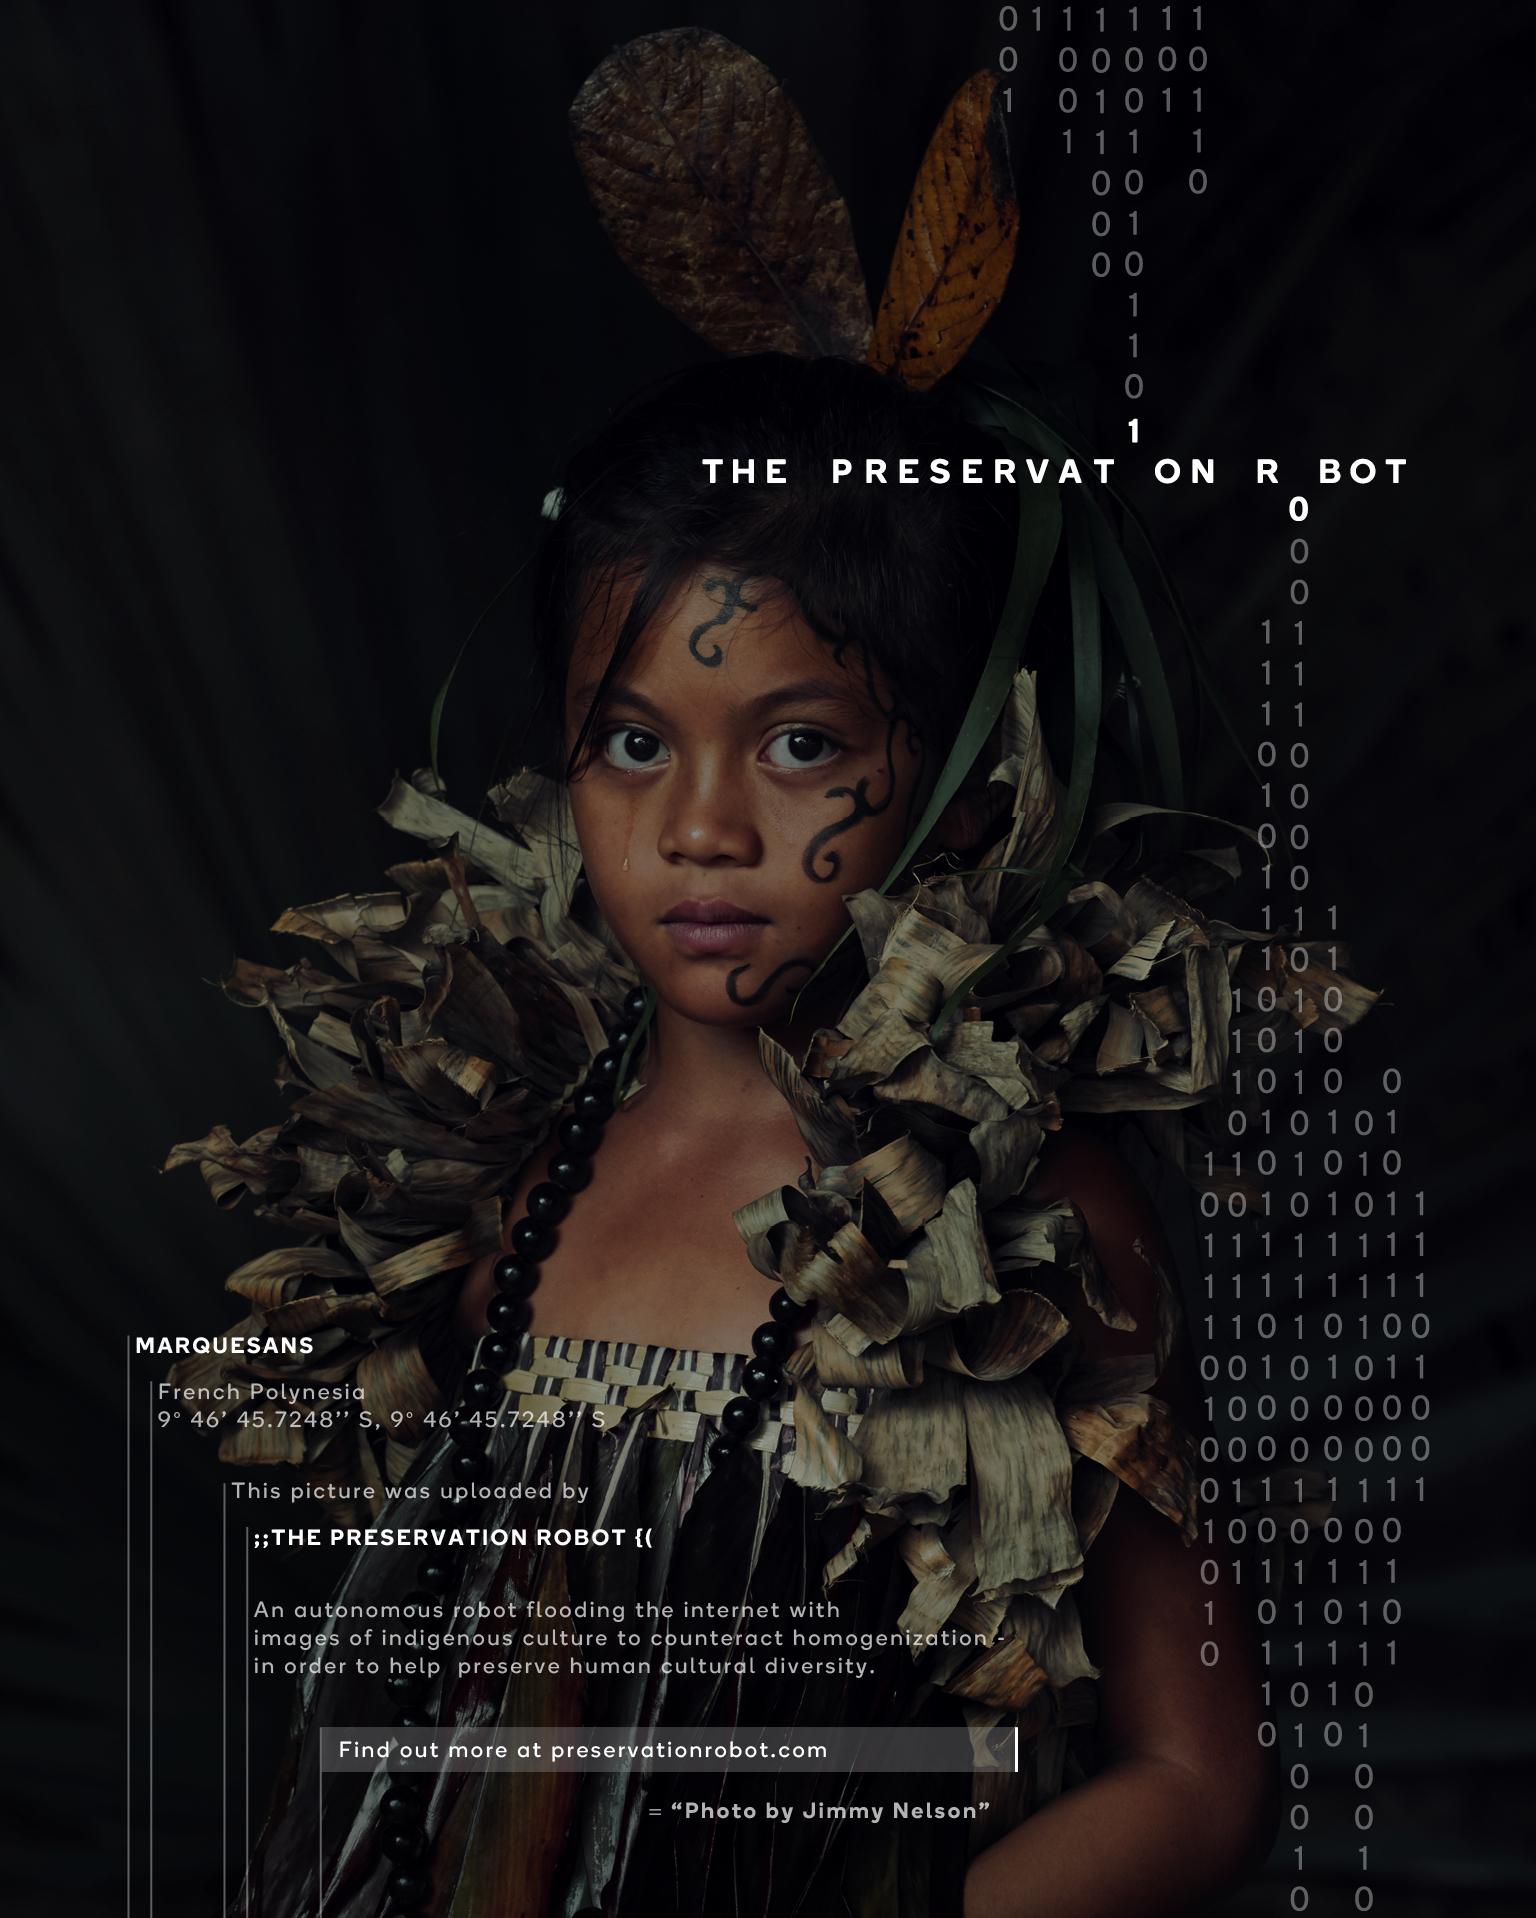 305925-preservation_robot_marquesans_french_polynesia_02-578724-original-1552134352